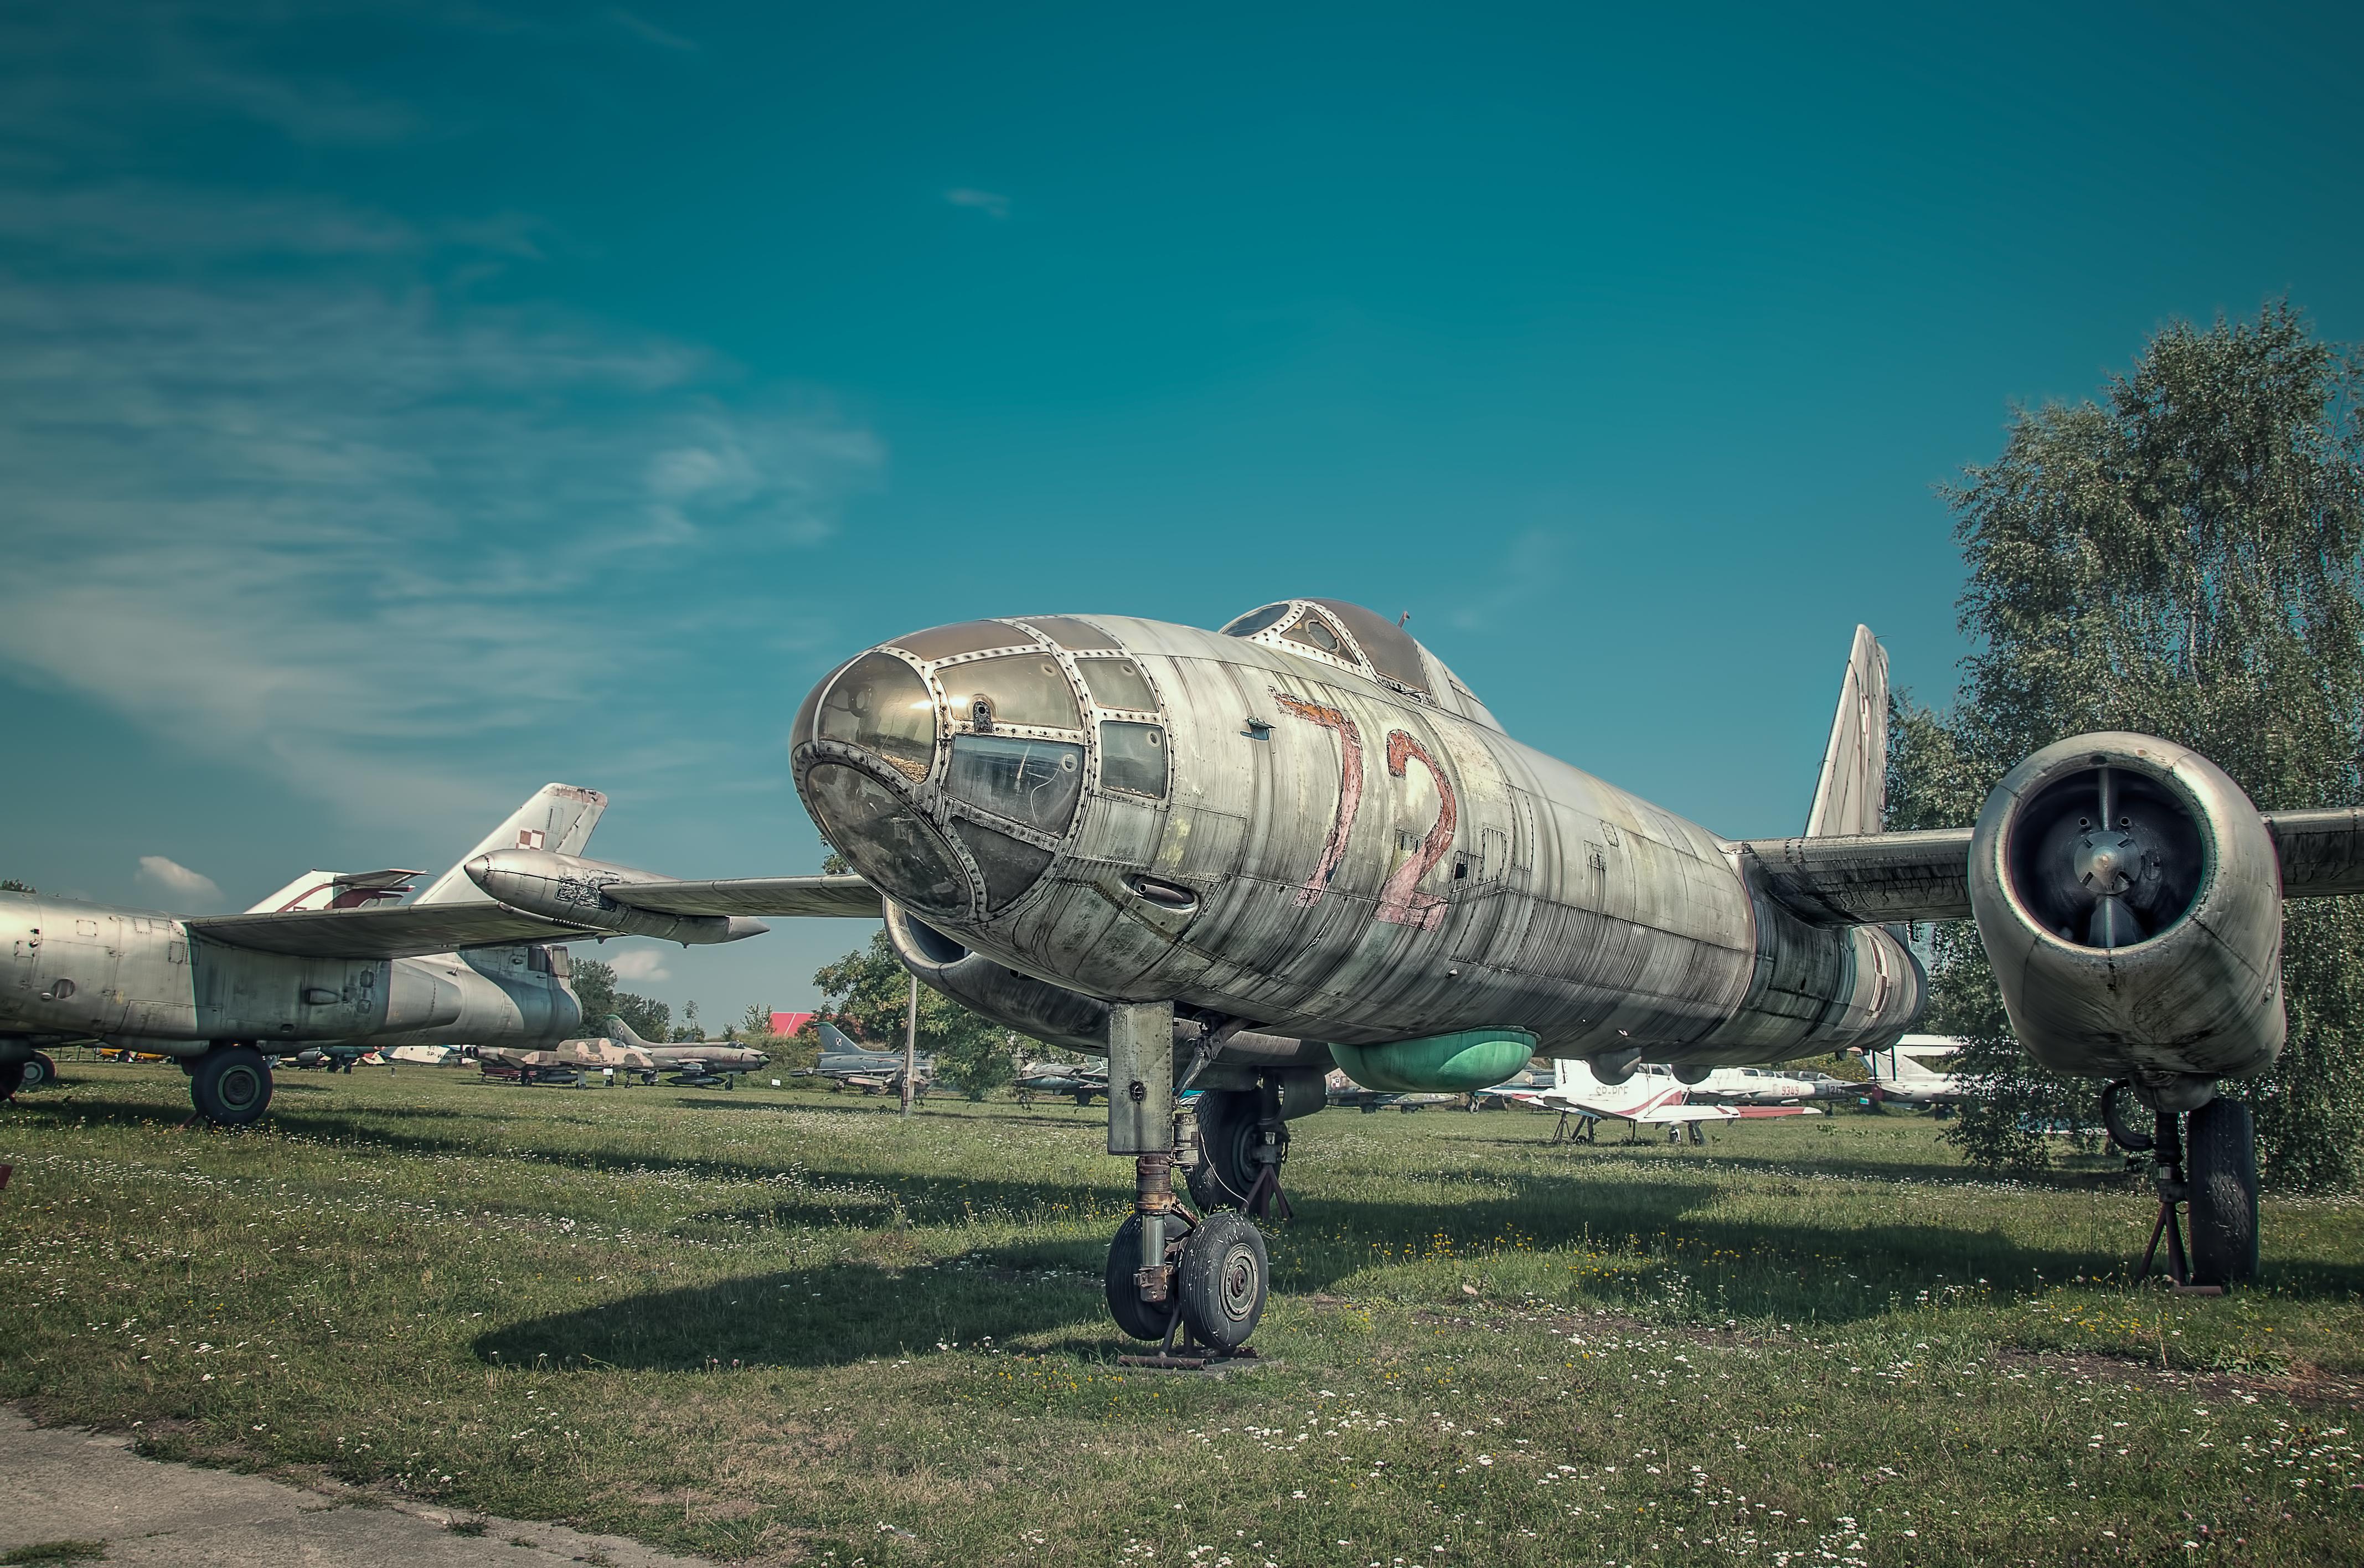 Ilyushin Il-28 by kryminalistycy-STOCK